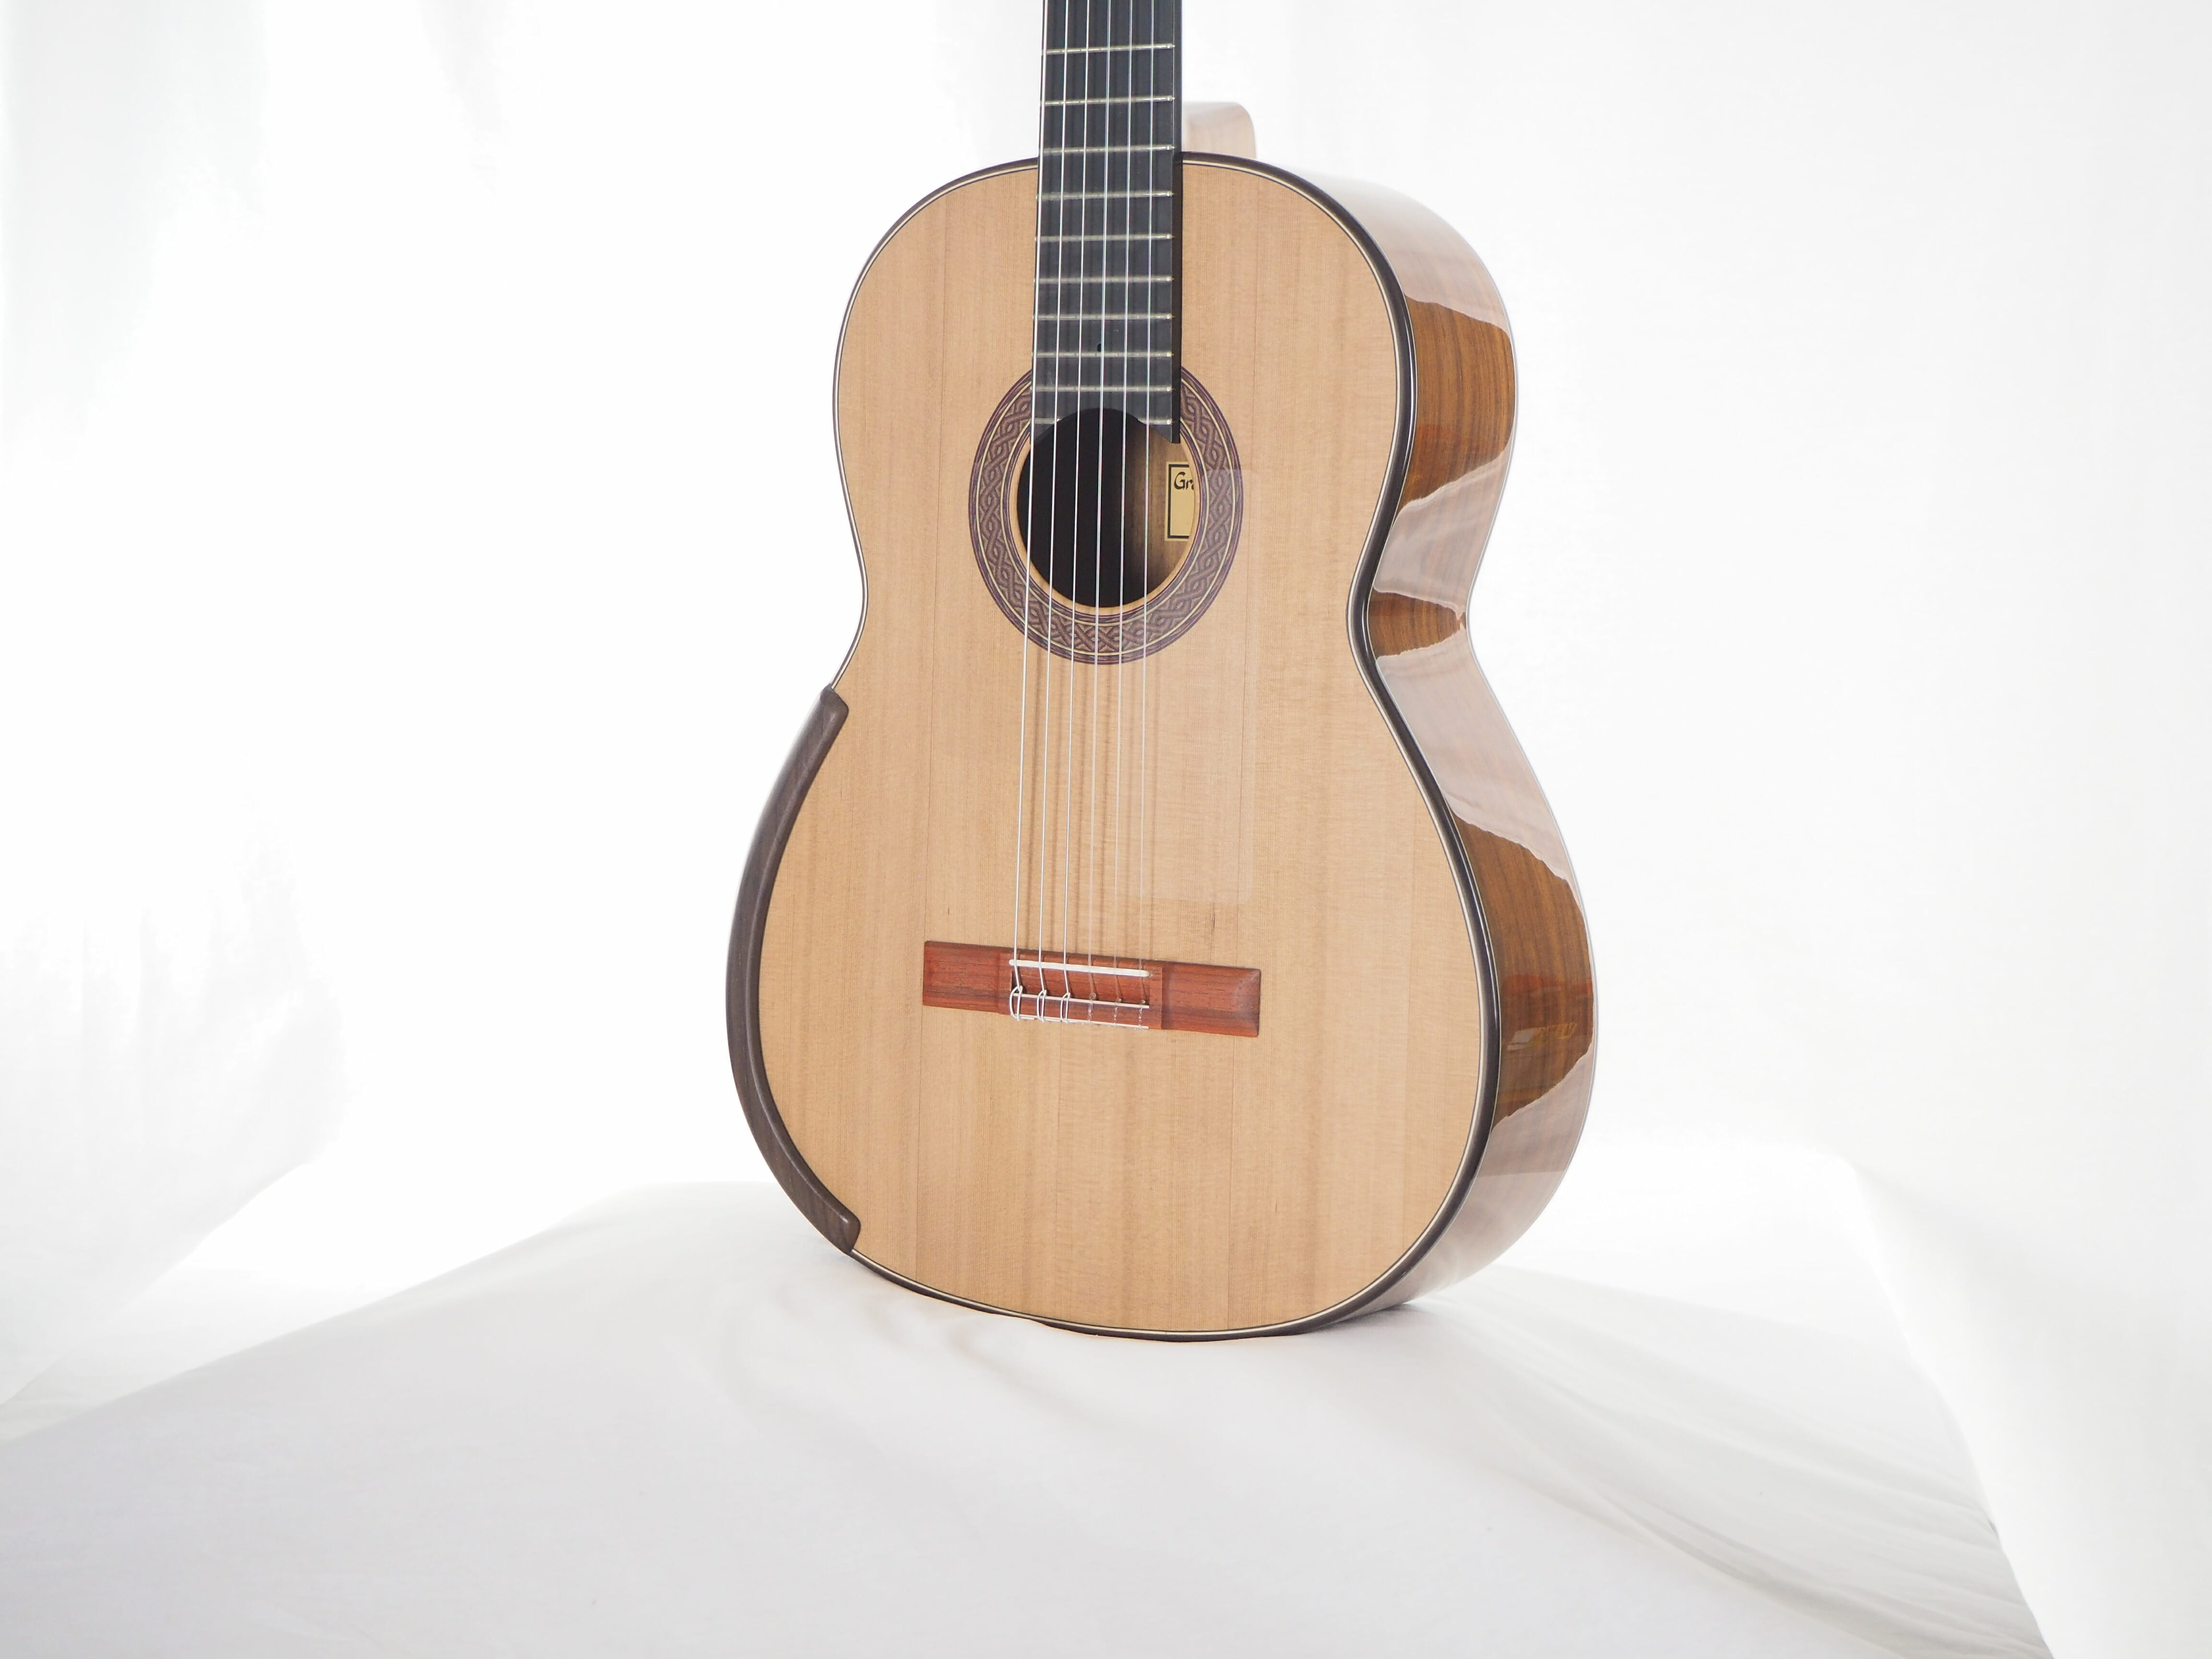 Greg Smallman & sons guitare classique de luthier lattice